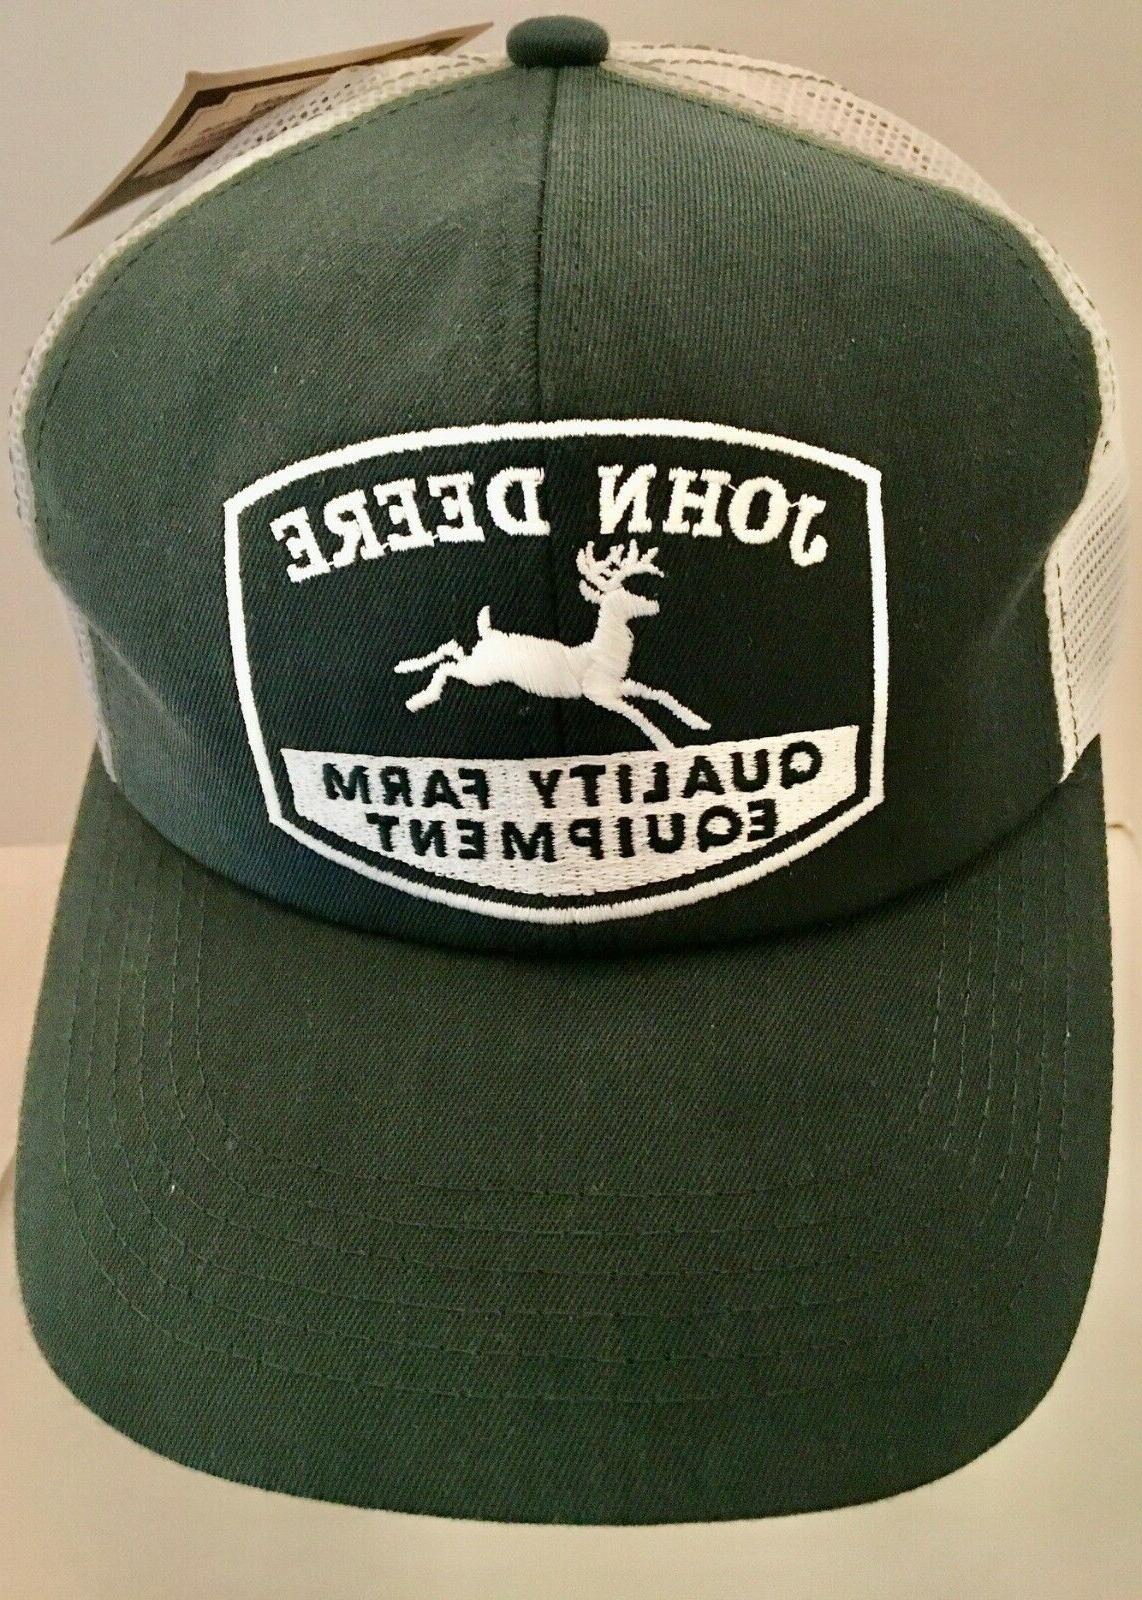 vintage teal green white mesh trucker hat